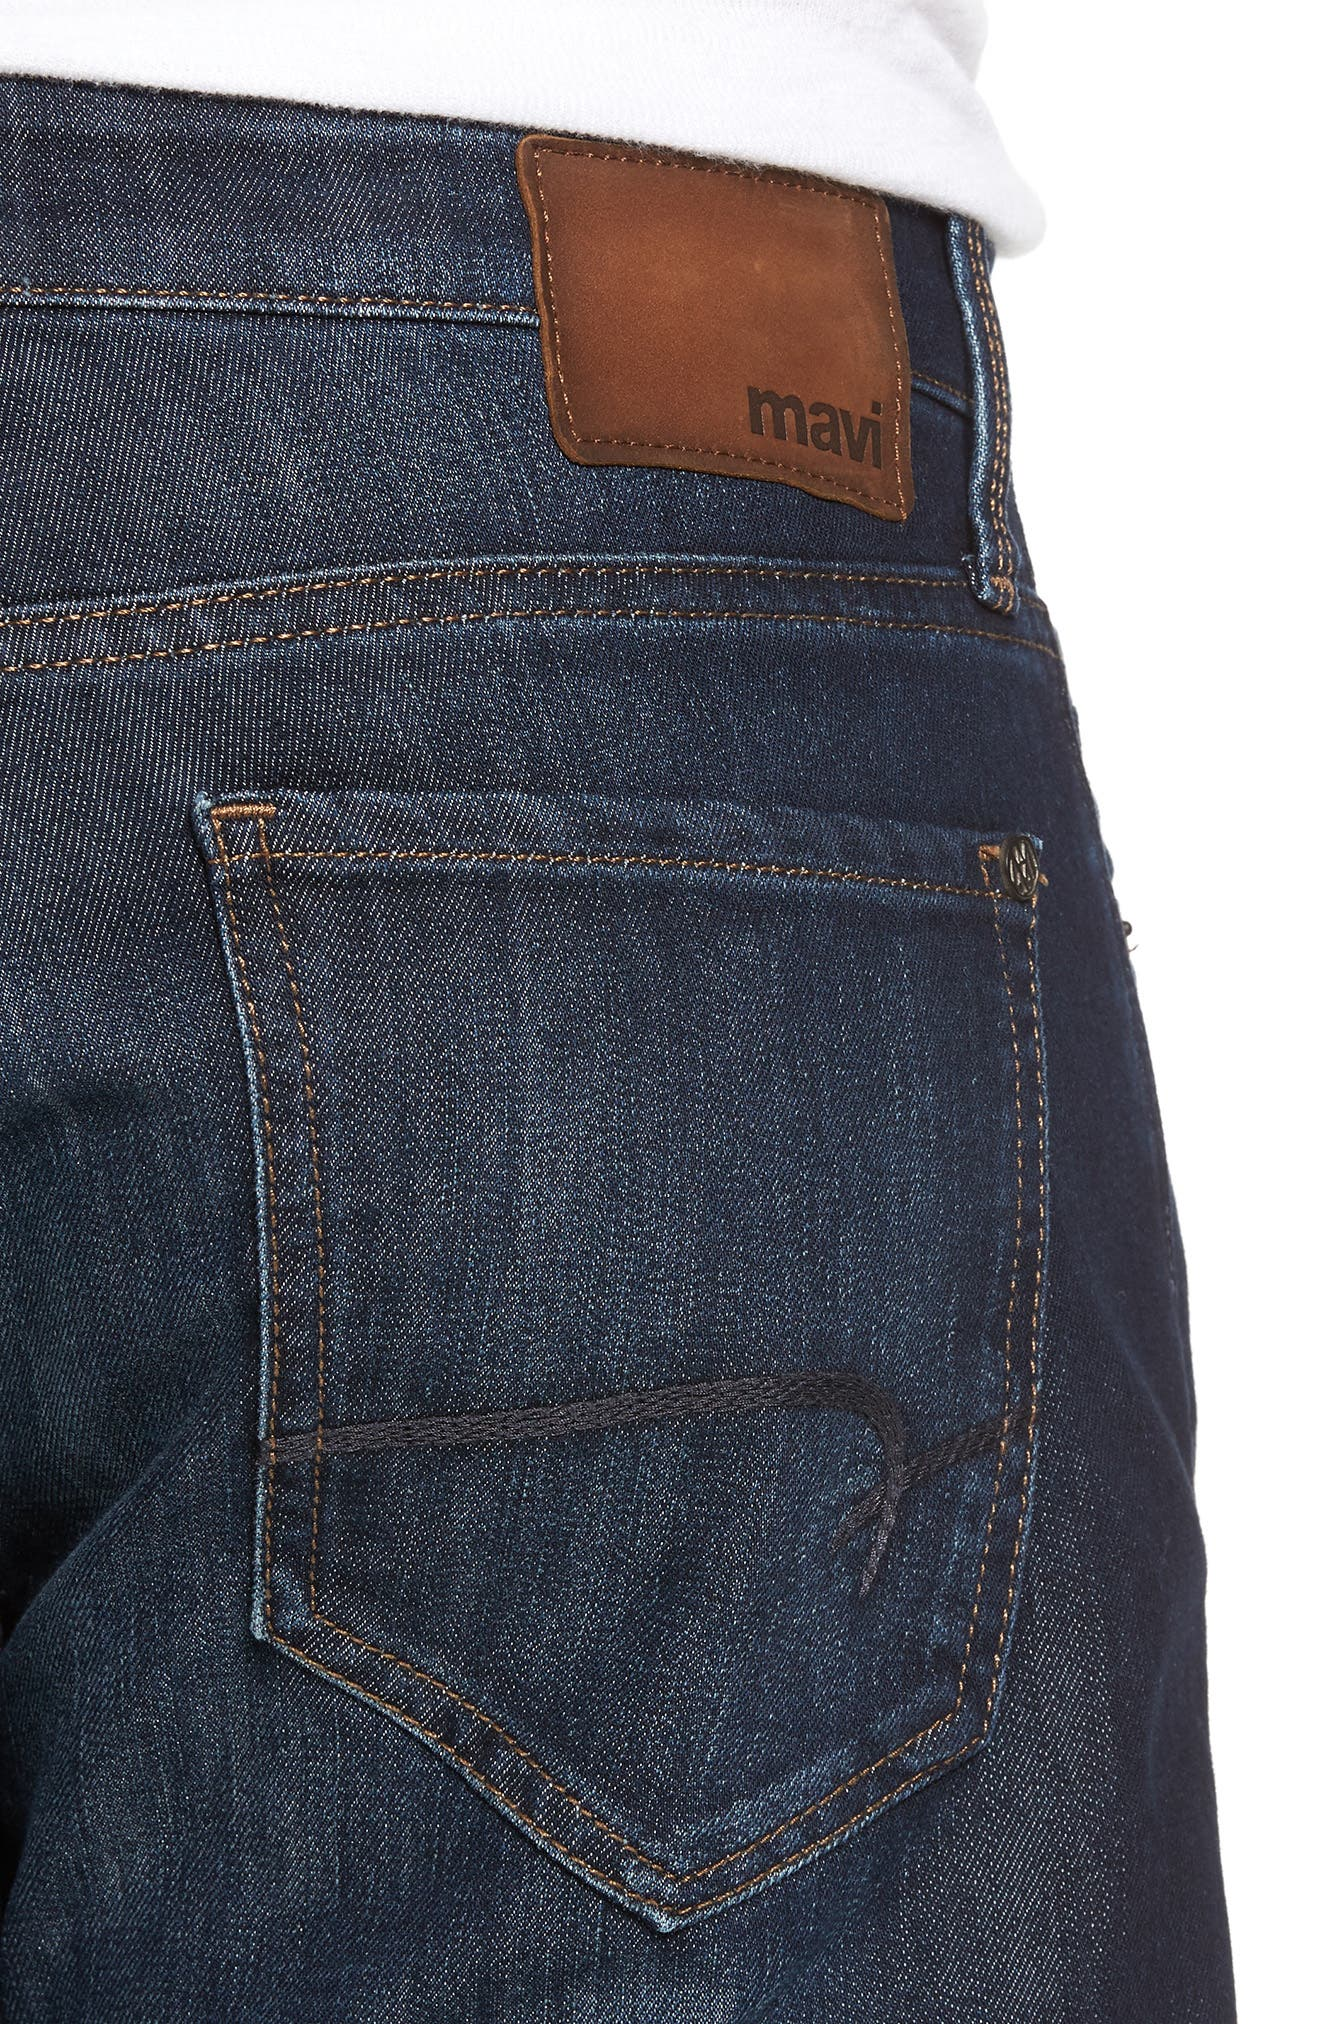 Zach Straight Leg Jeans,                             Alternate thumbnail 4, color,                             400